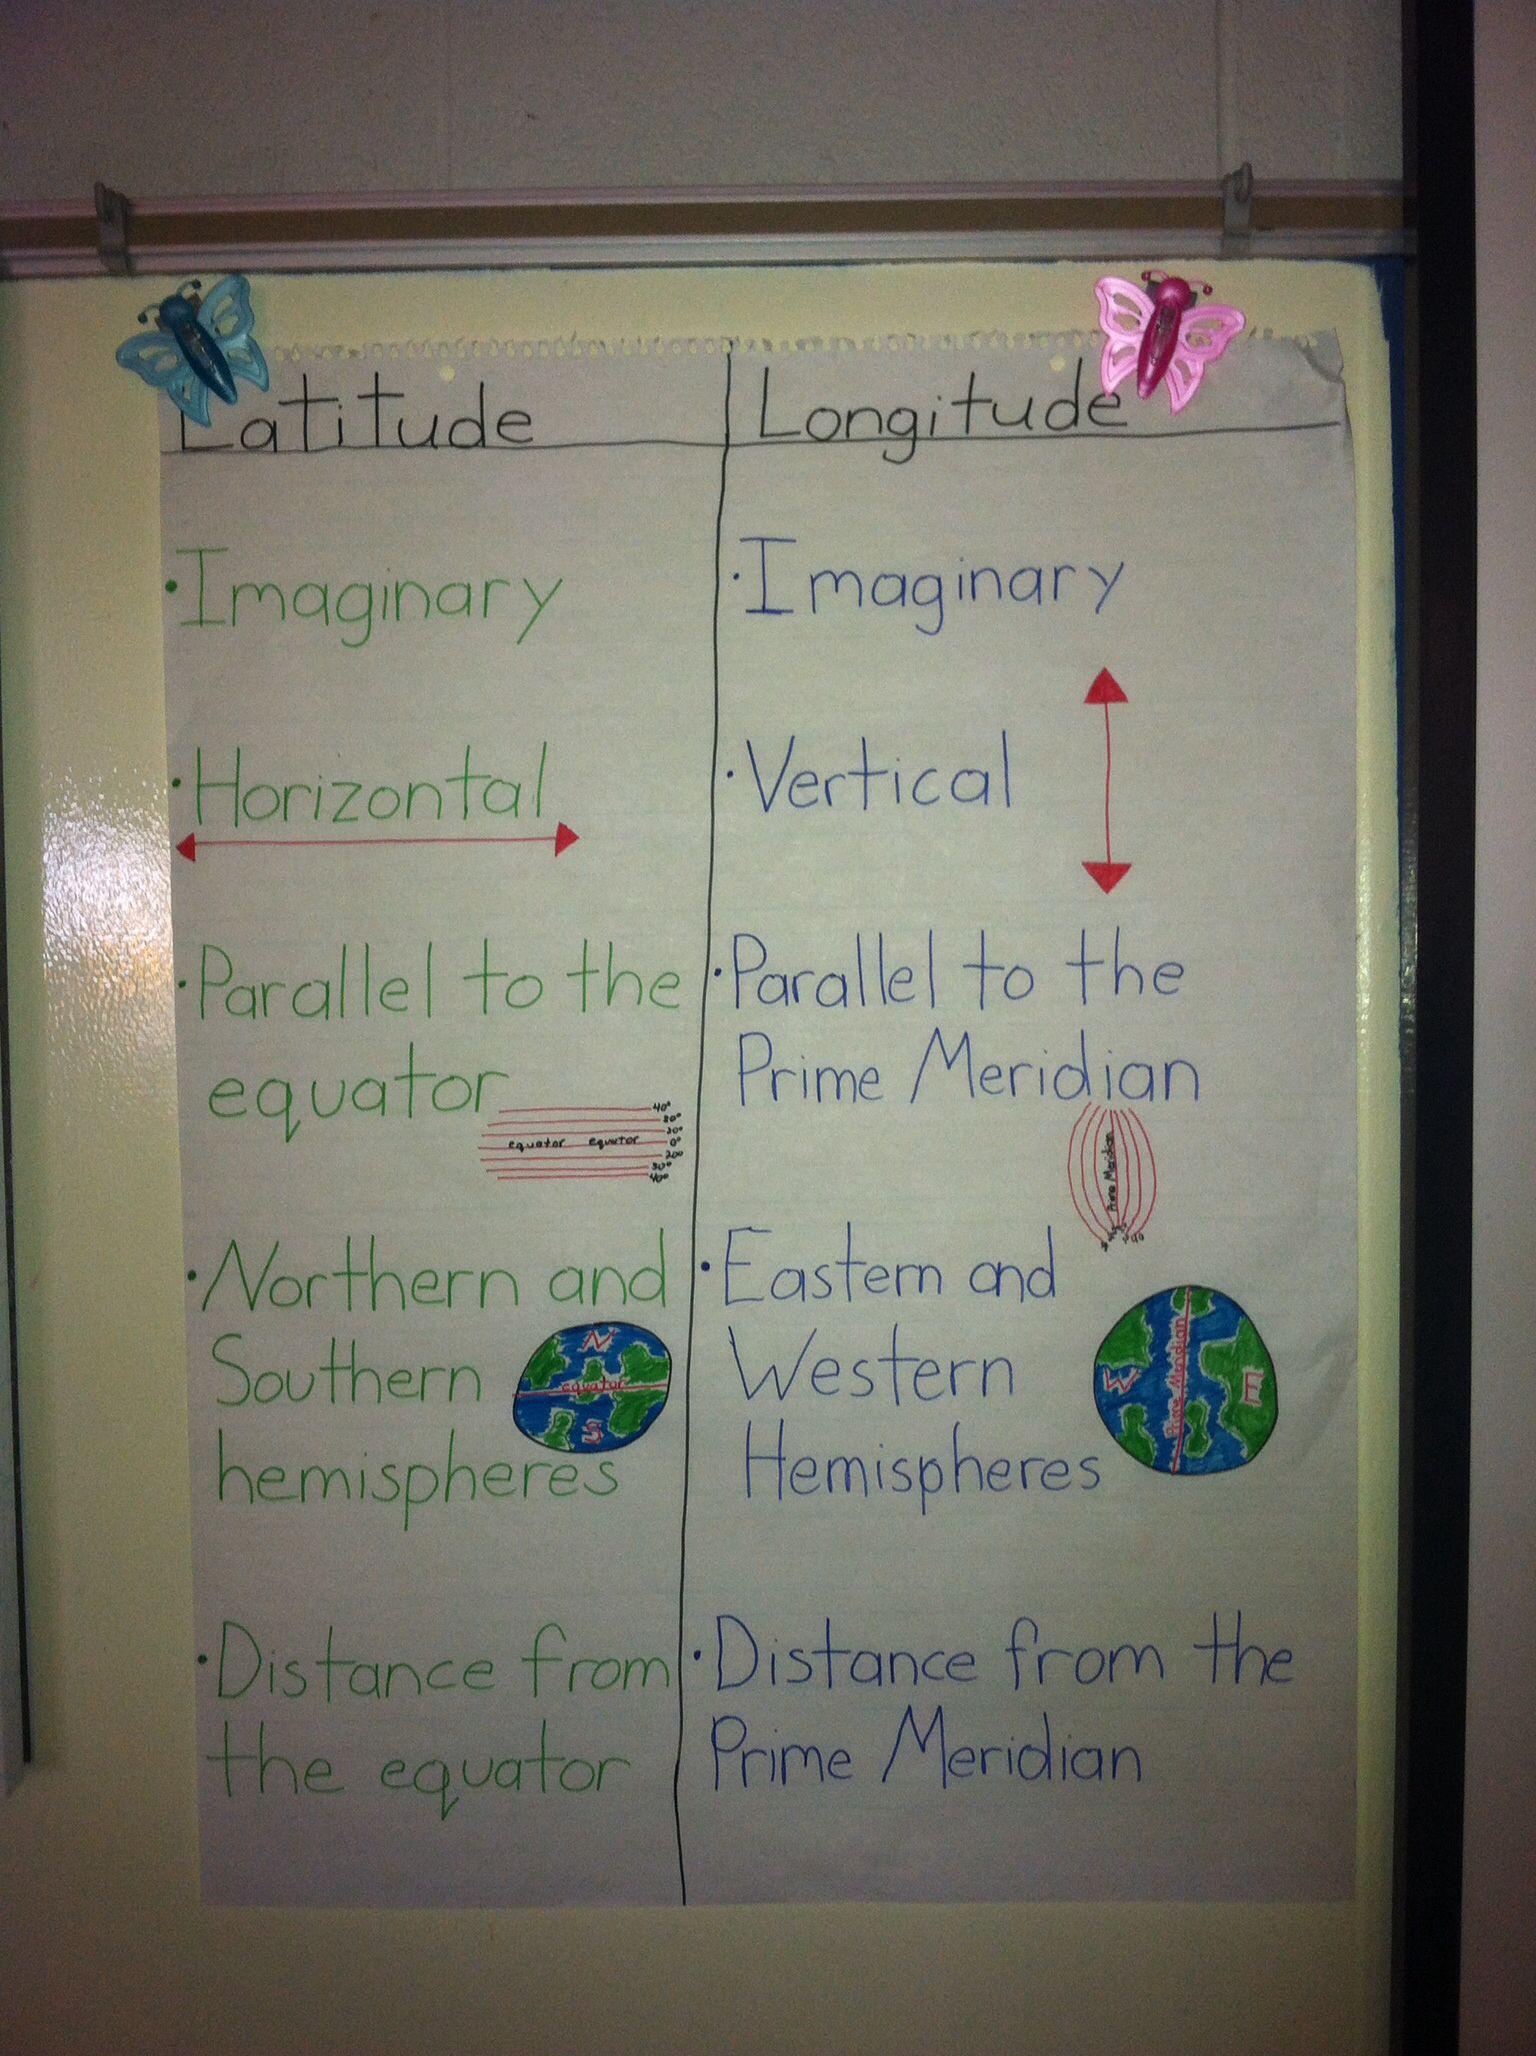 Mapping Activity Teaching About Coordinates Longitude Latitude - Map with latitude and longitude parallel